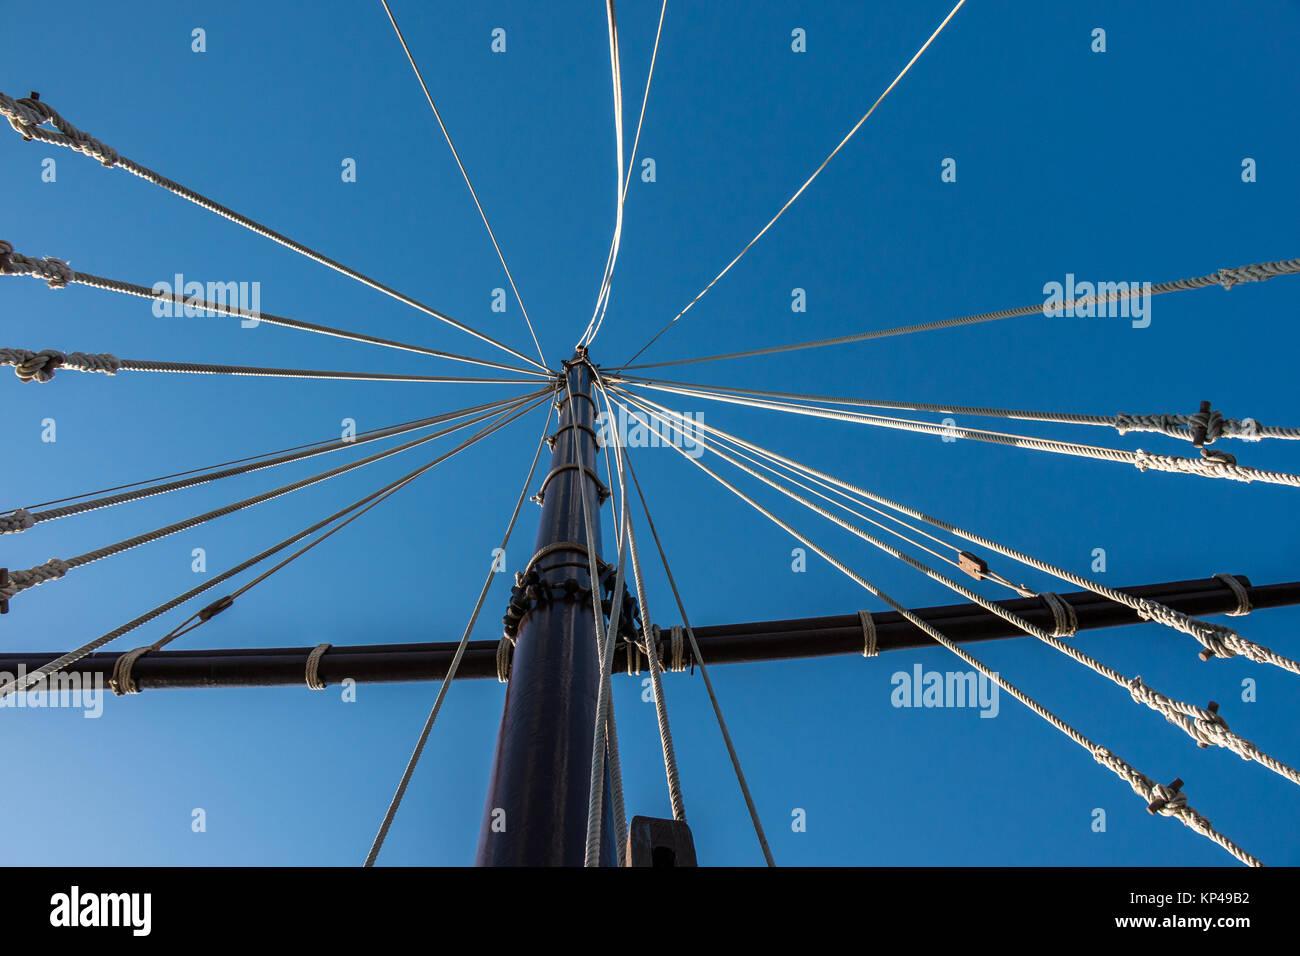 Mast and ropes of a spanish sailing ship - Stock Image